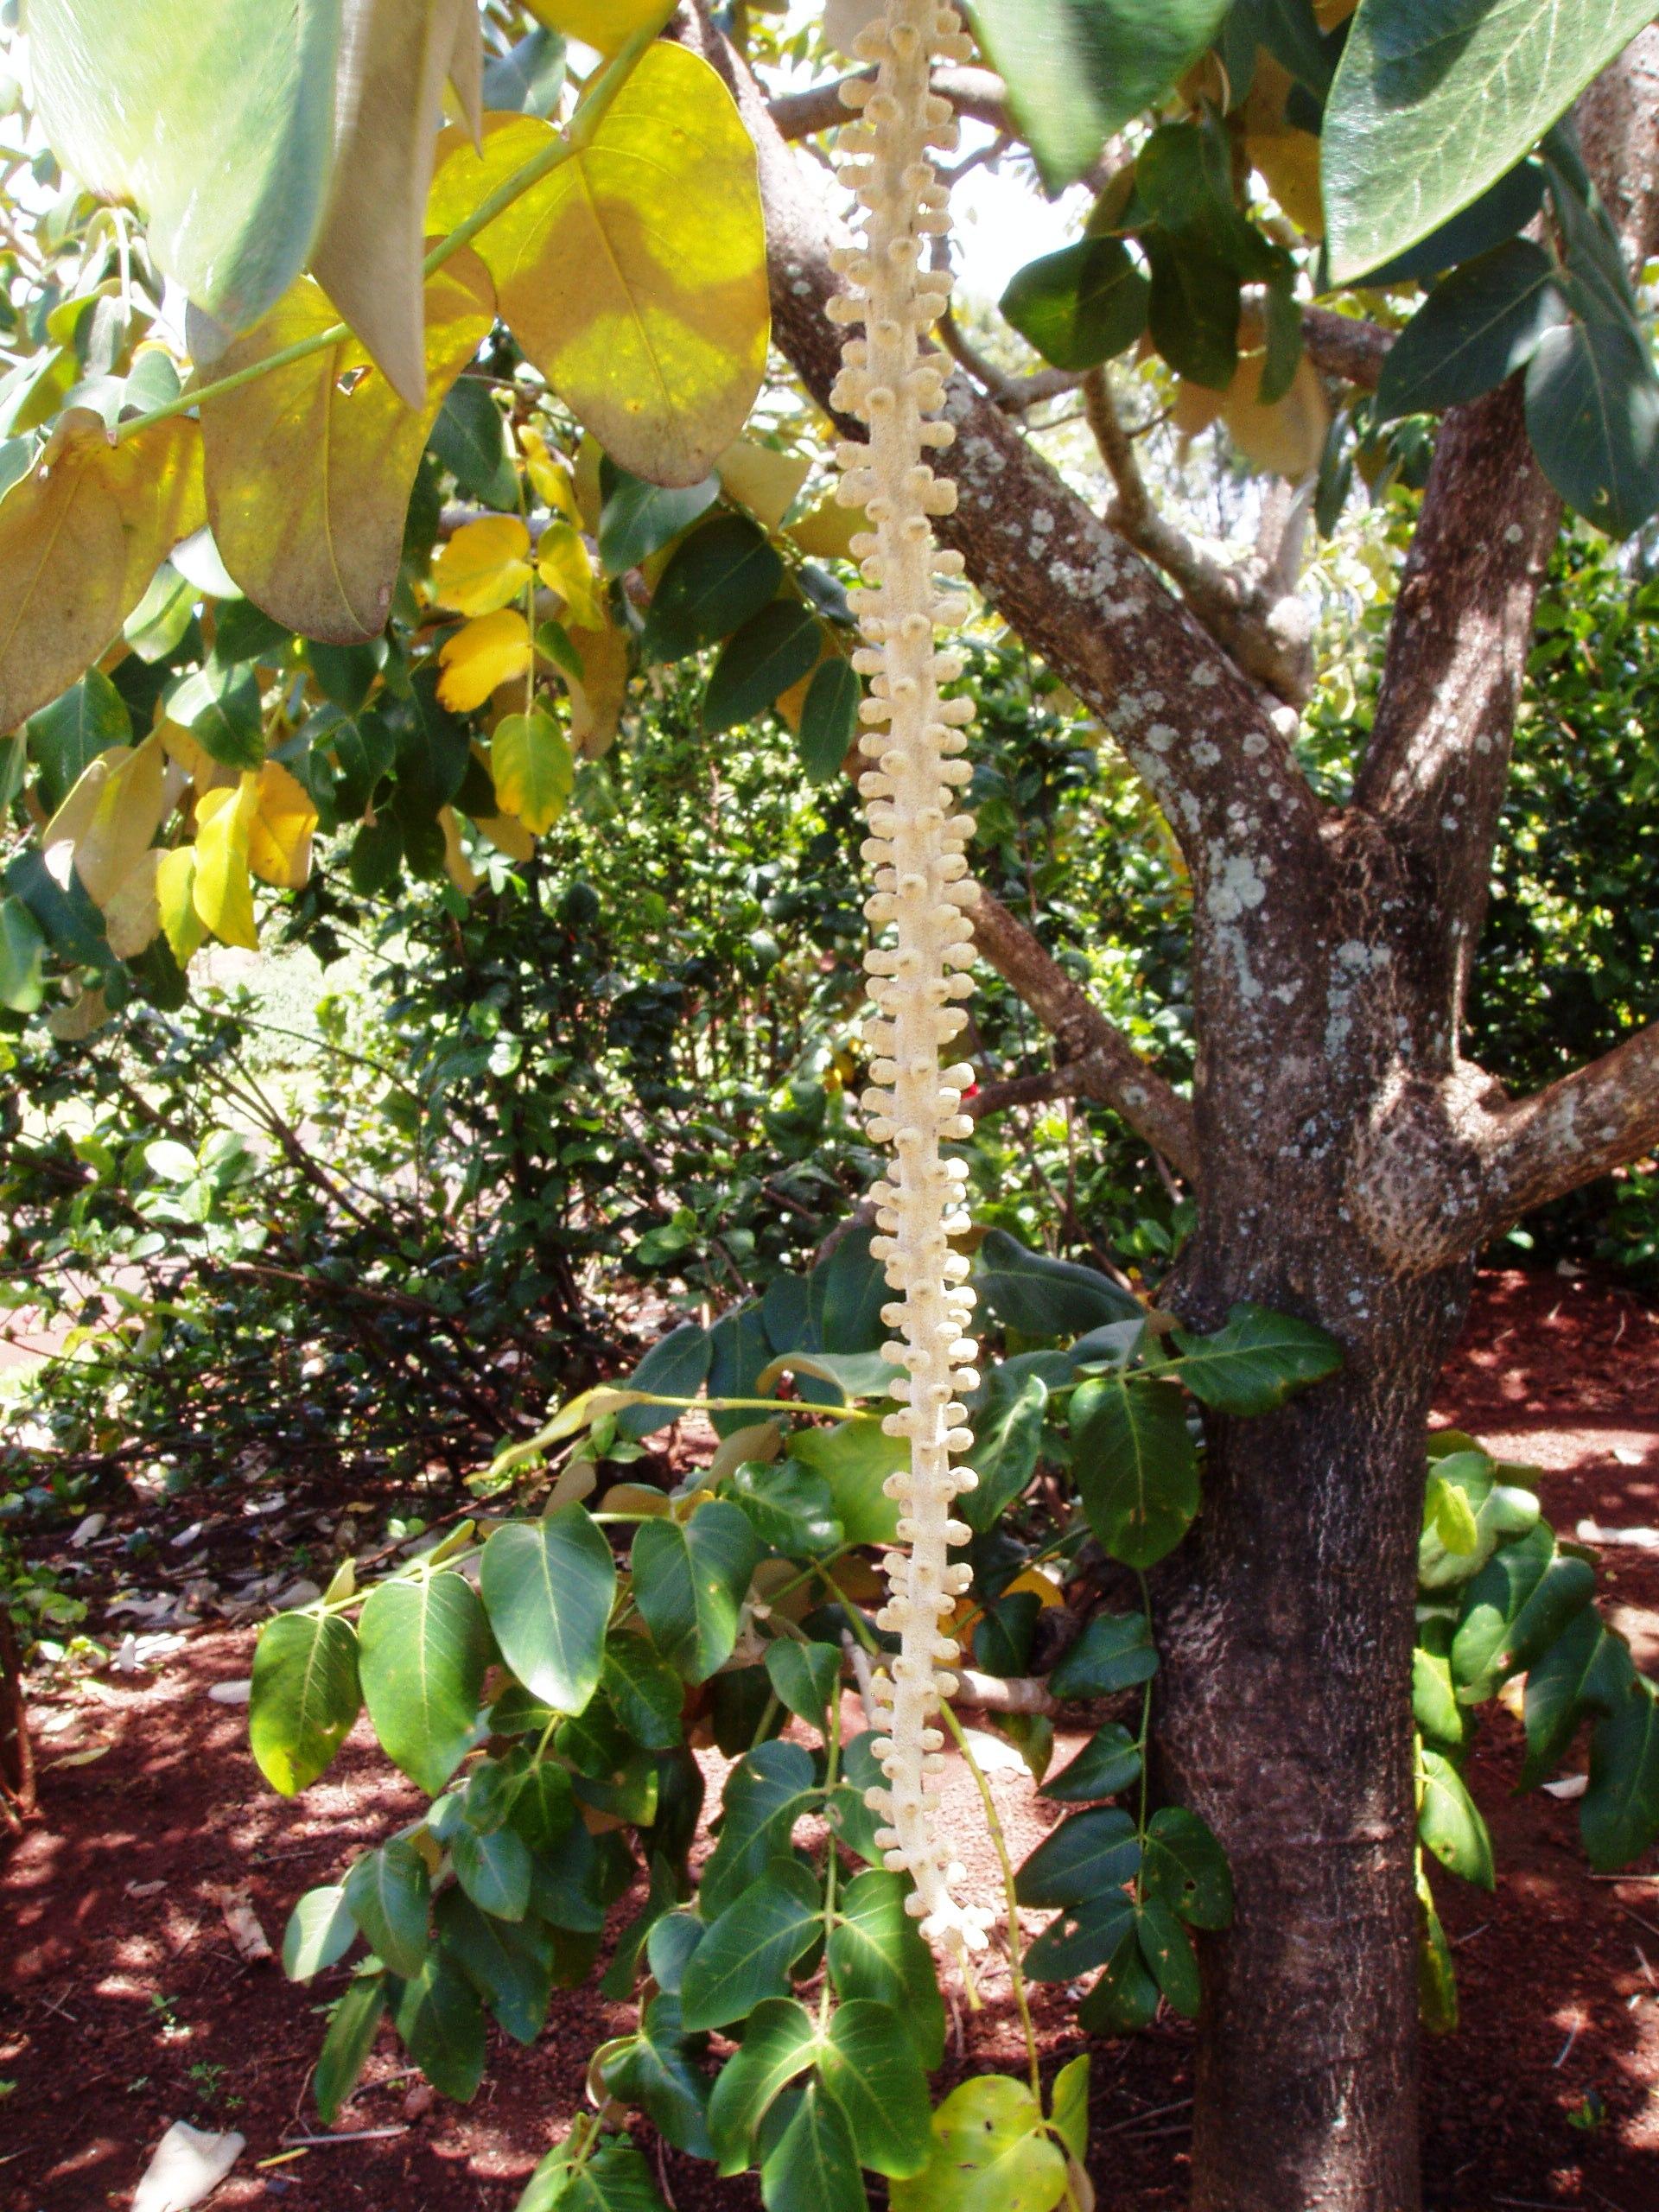 File:Munroidendron Racemosum (National Tropical Botanical Garden, Kauai,  Hawaii).JPG